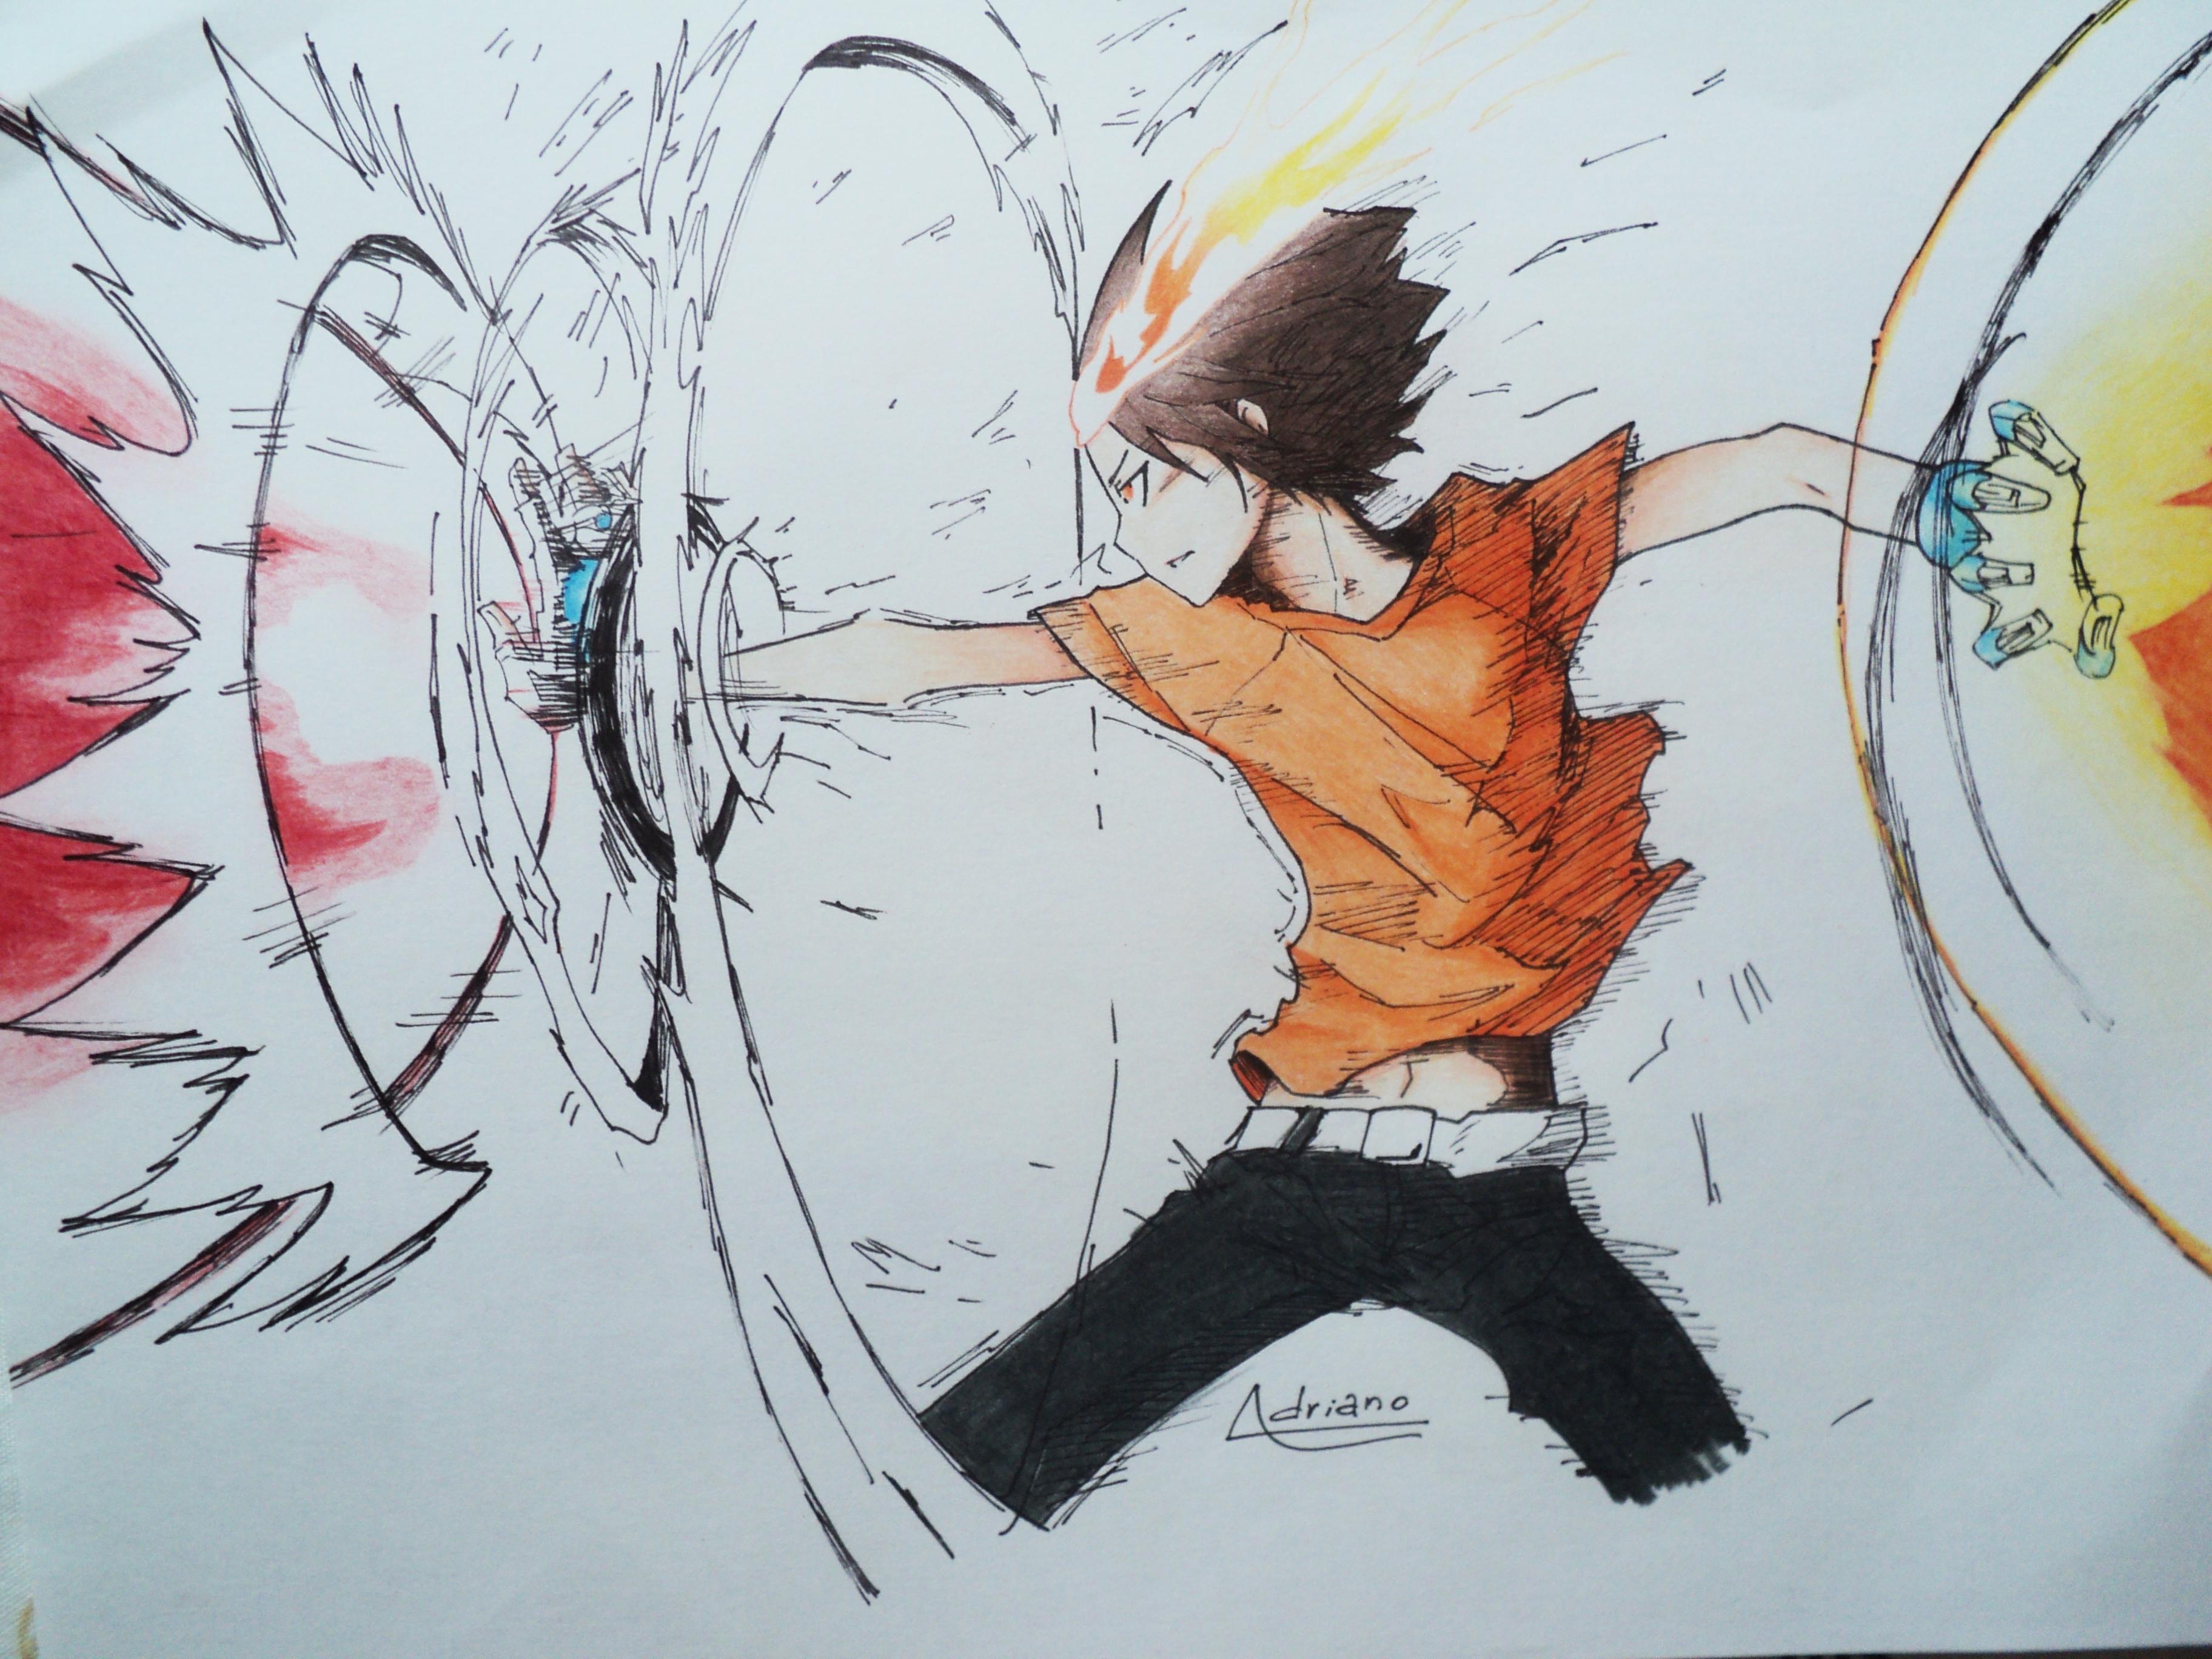 X Burner Tsuna By Adrianol Drawings On Deviantart